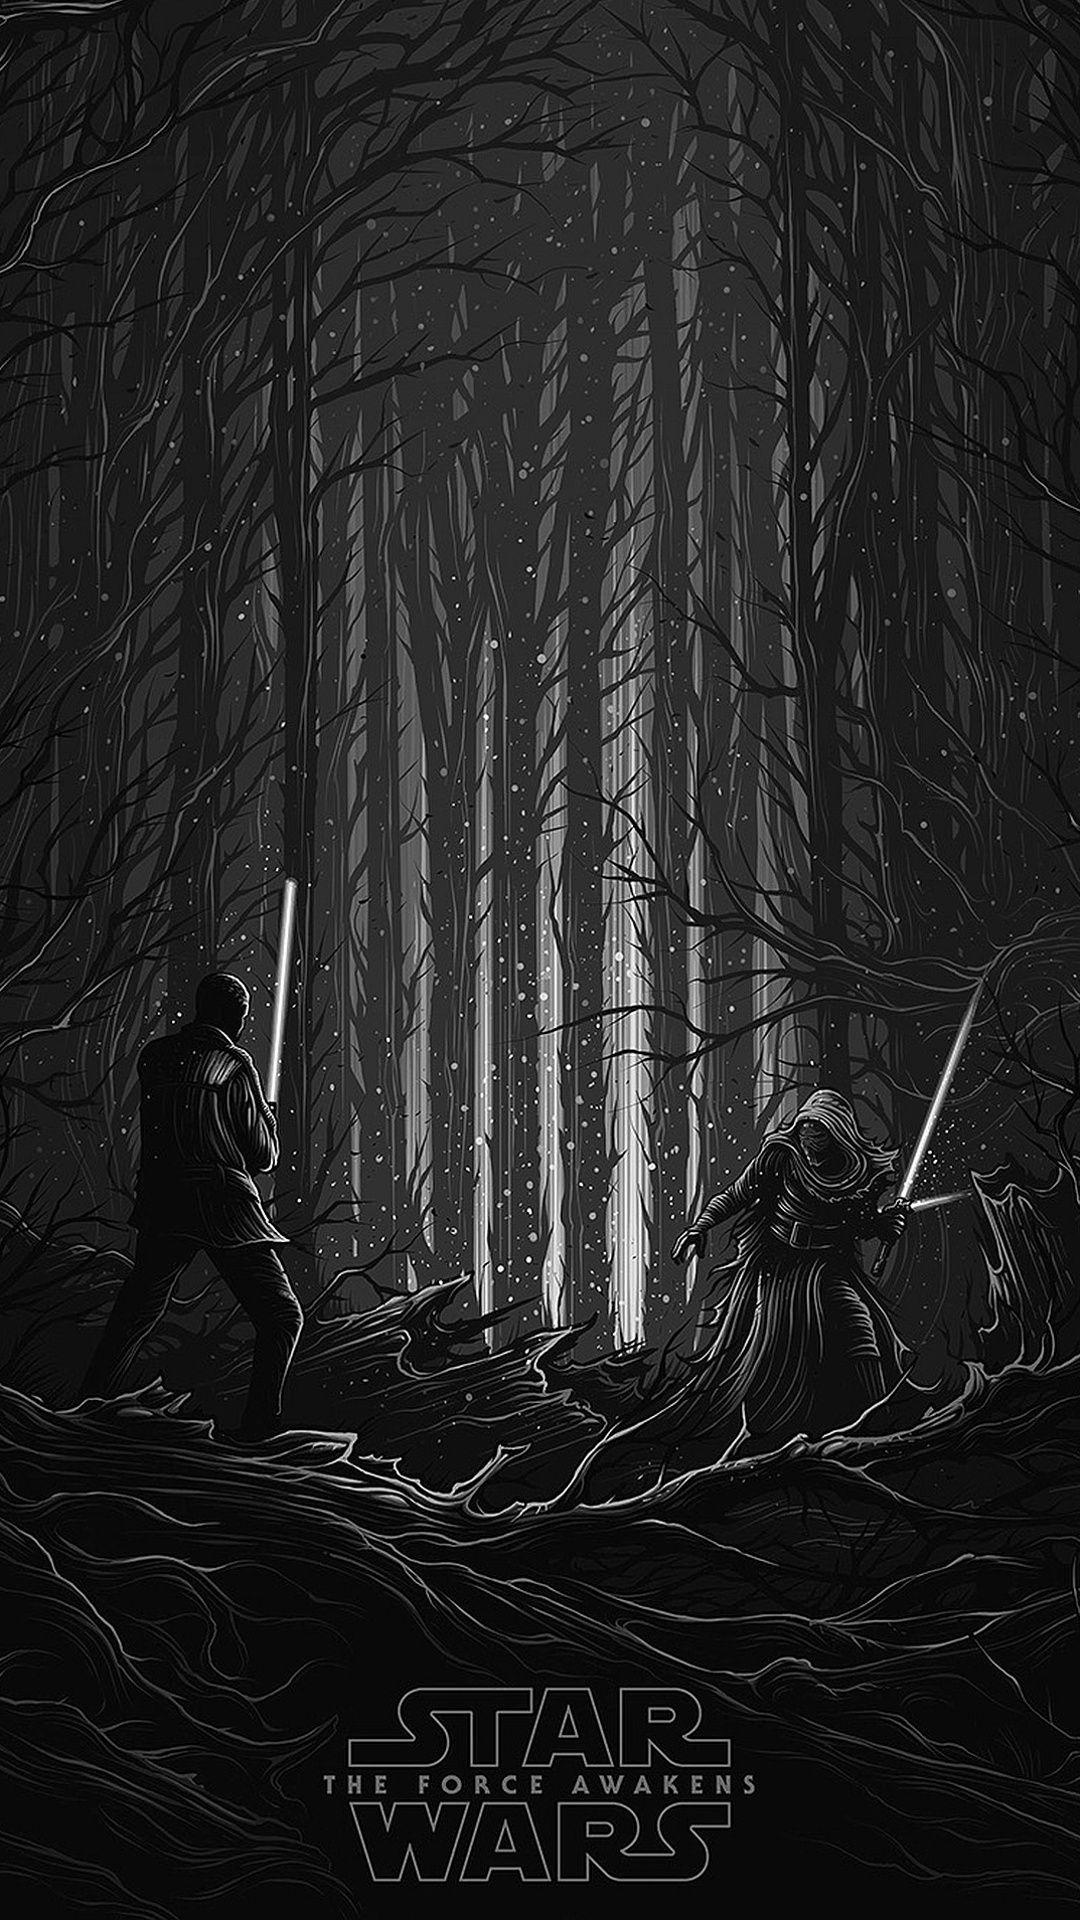 Star Wars Wallpaper Star Wars Wallpaper Dark Black Wallpaper Star Wars